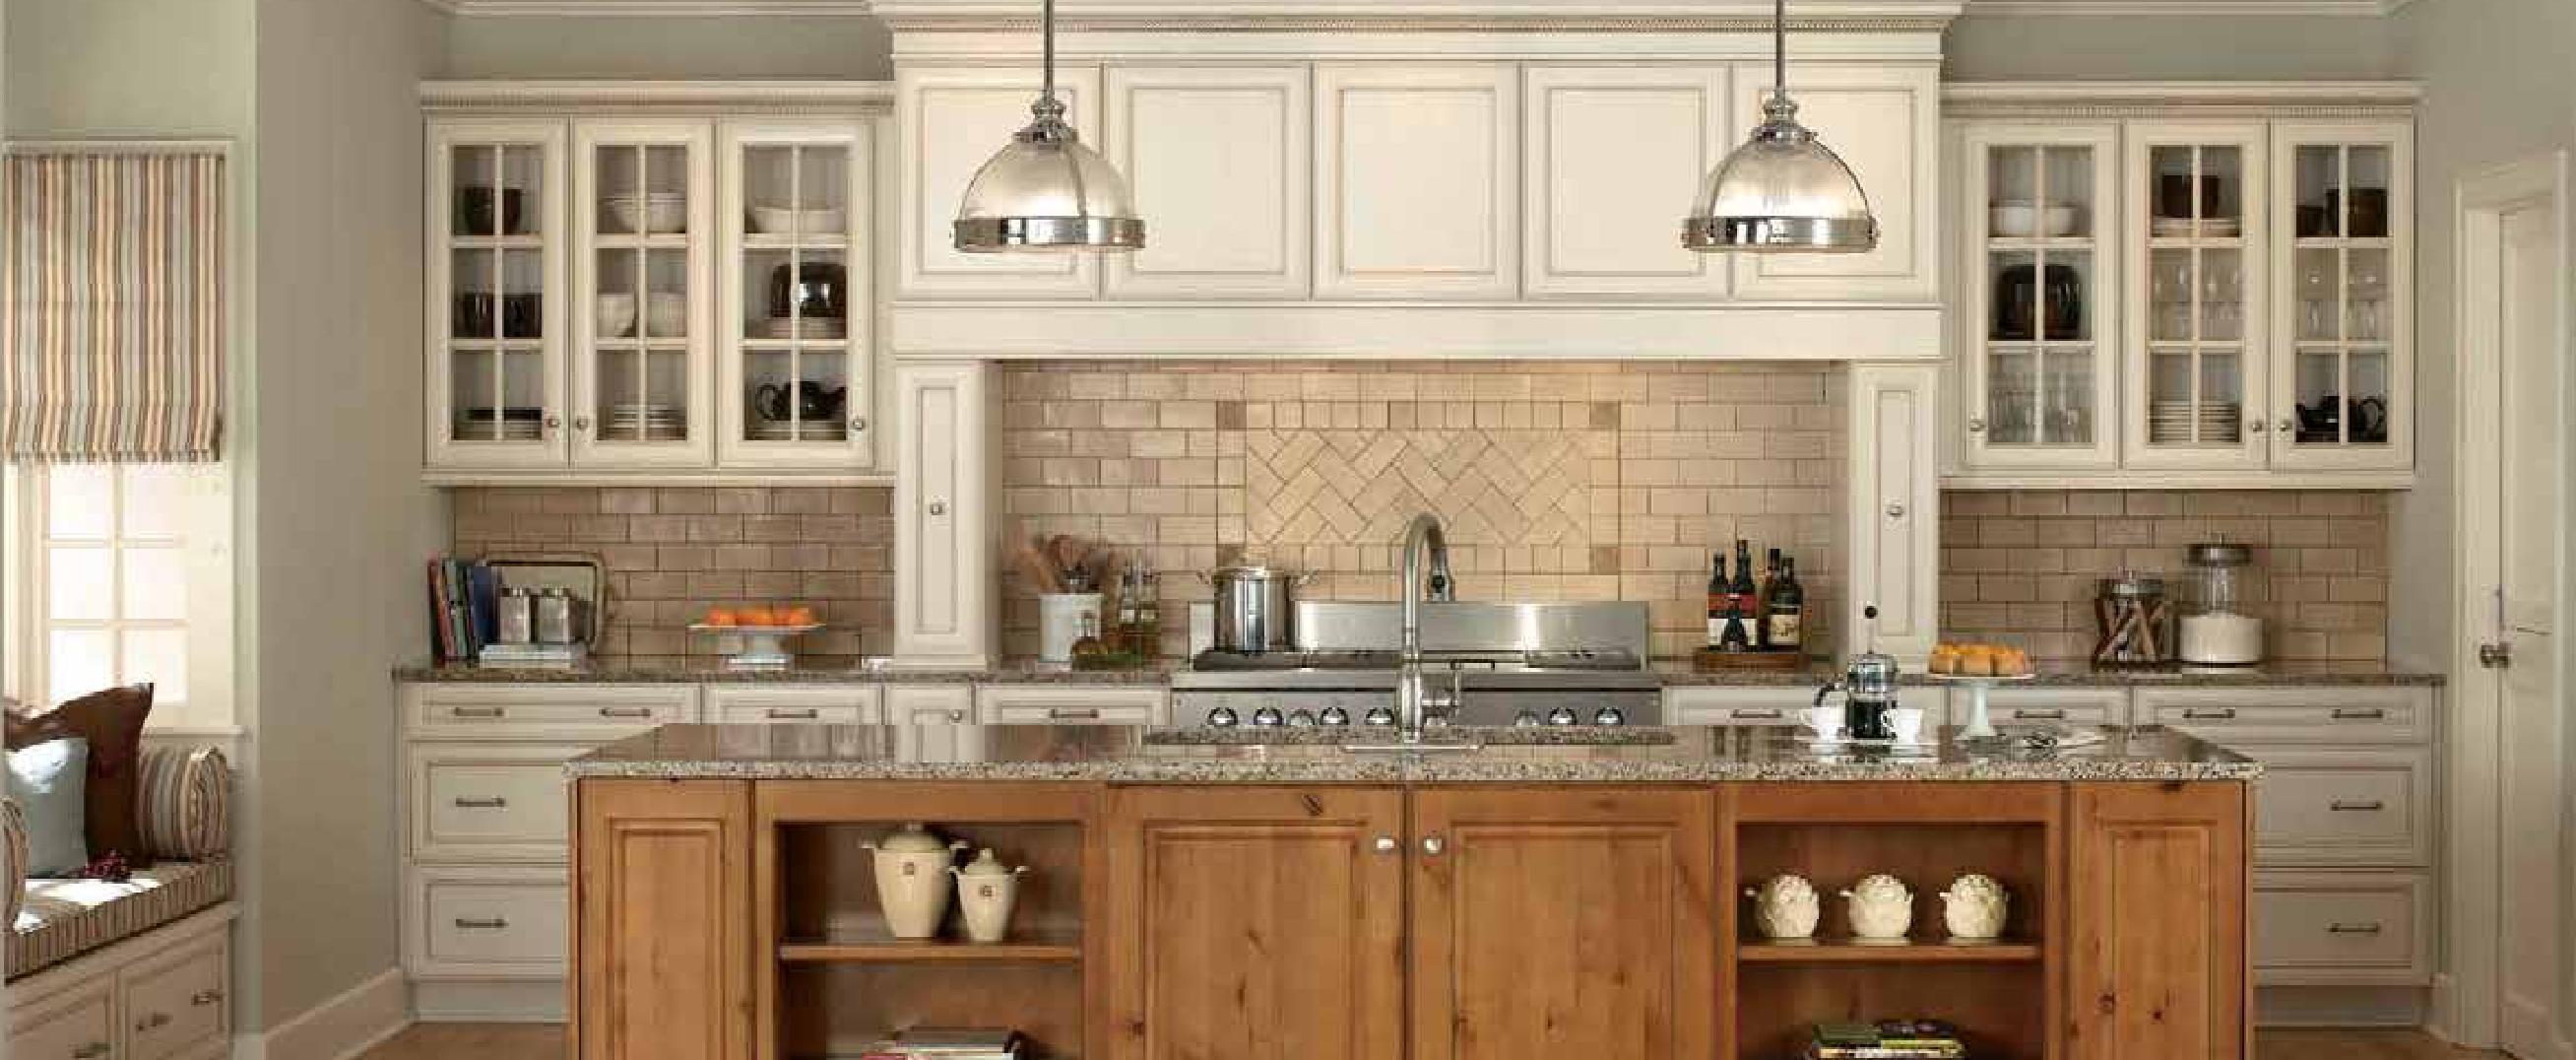 Sullivan & Duncan cabinets from Norcraft Cabinetry. Sullivan: Maple ...